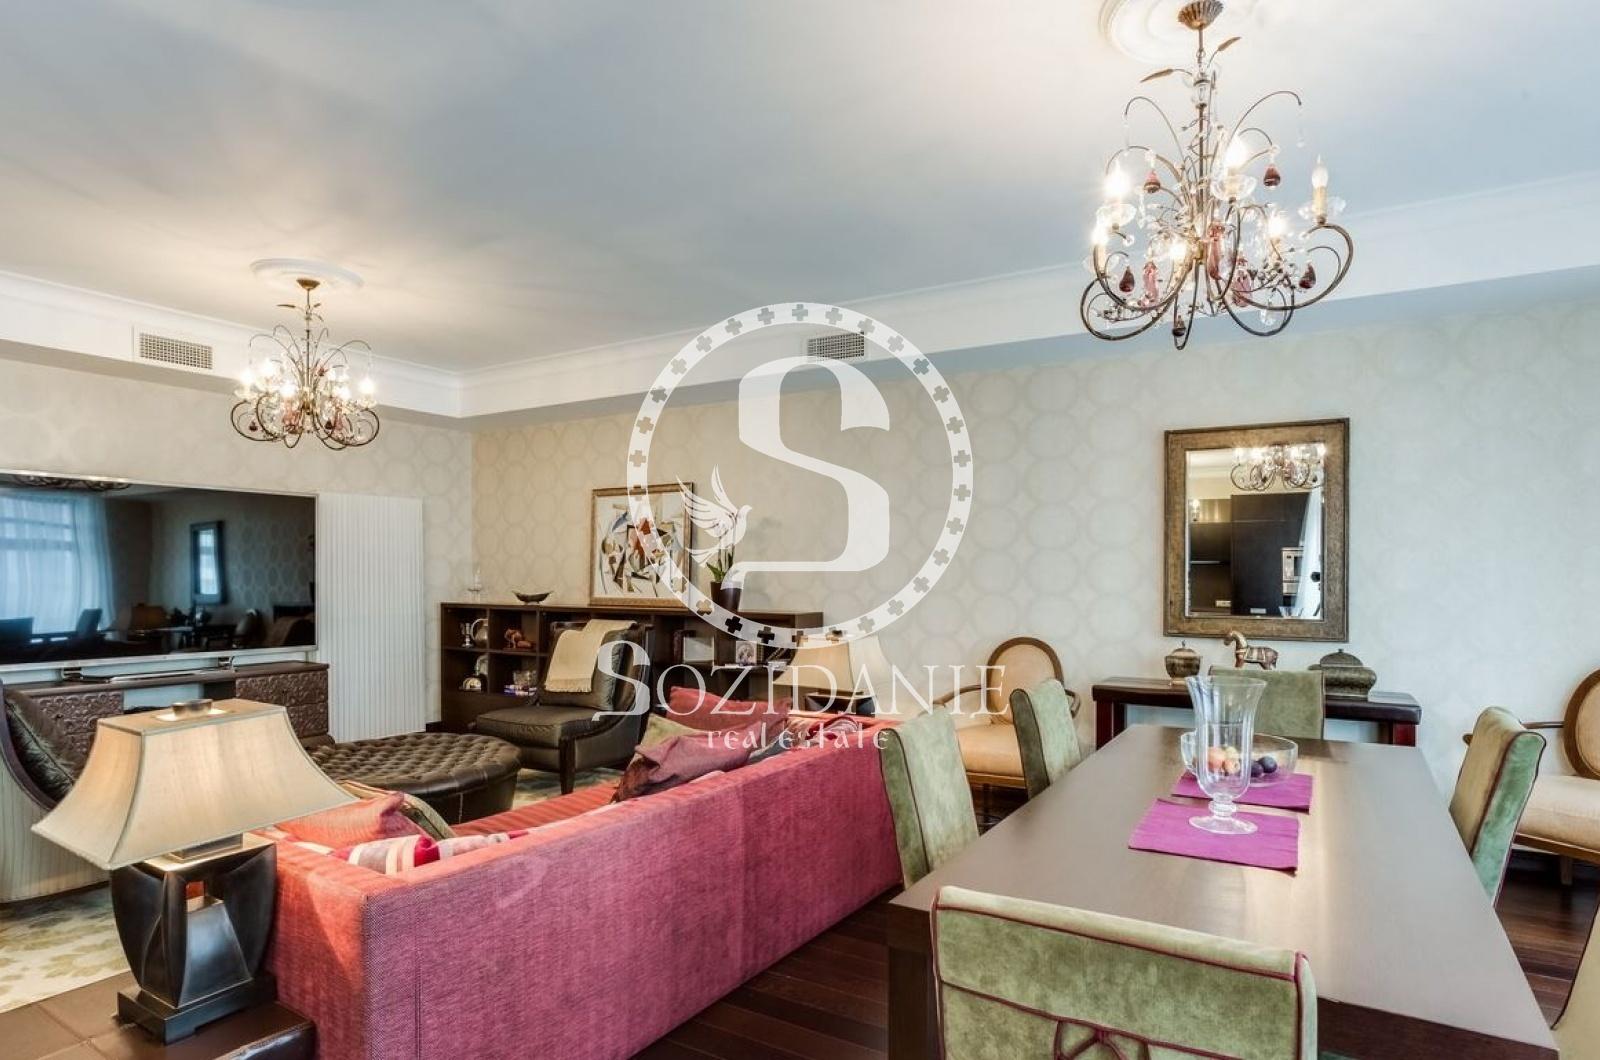 3 Комнаты, Городская, Аренда, Малый Каковинский переулок, Listing ID 3316, Москва, Россия,